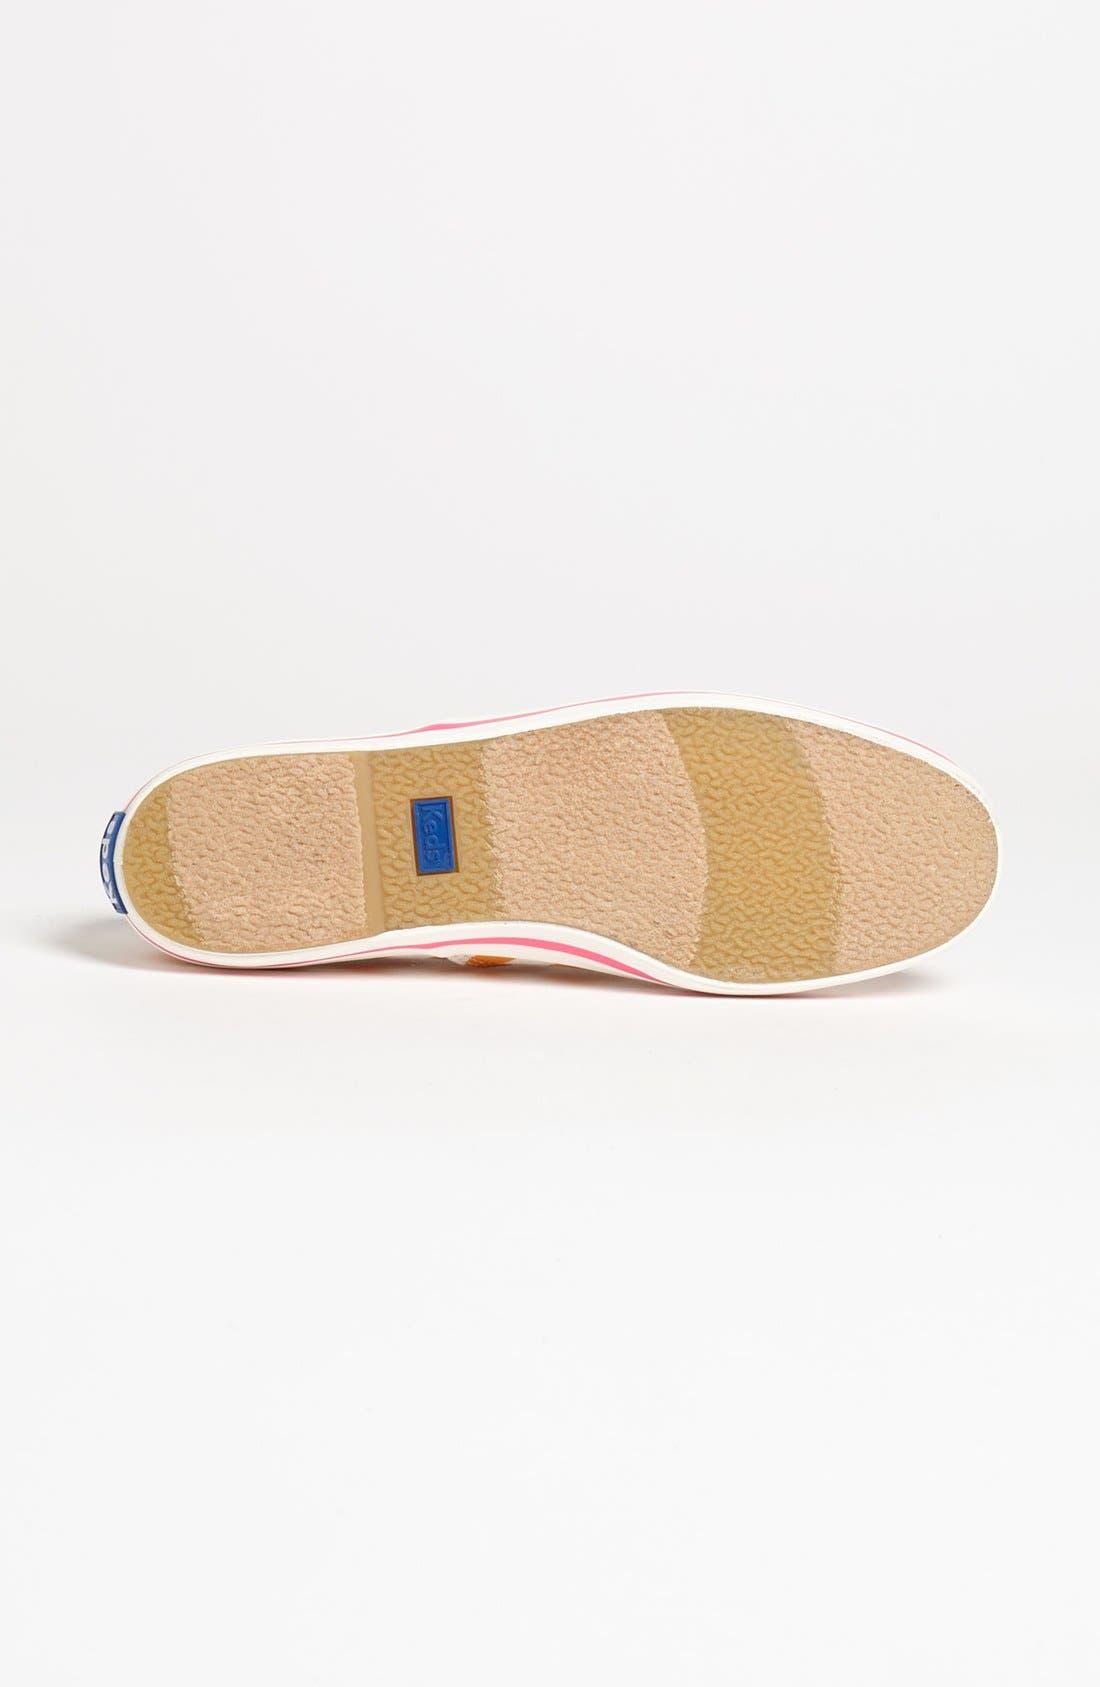 Keds<sup>®</sup> for kate spade new york 'kick' sneaker,                             Alternate thumbnail 8, color,